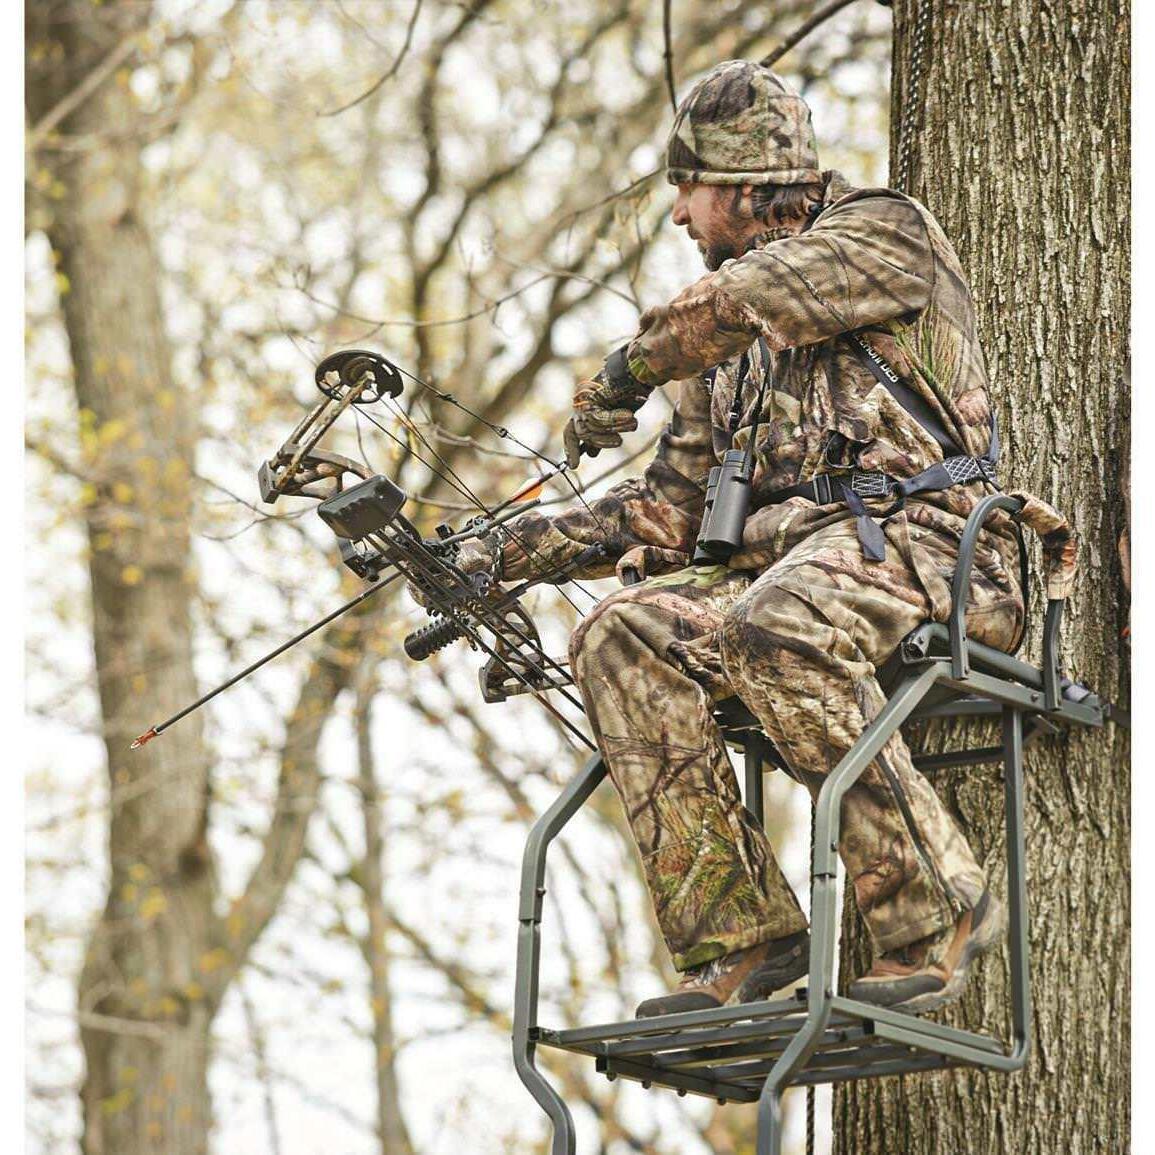 Ladder Stand Hunting Deer Tree Crossbow Shooting